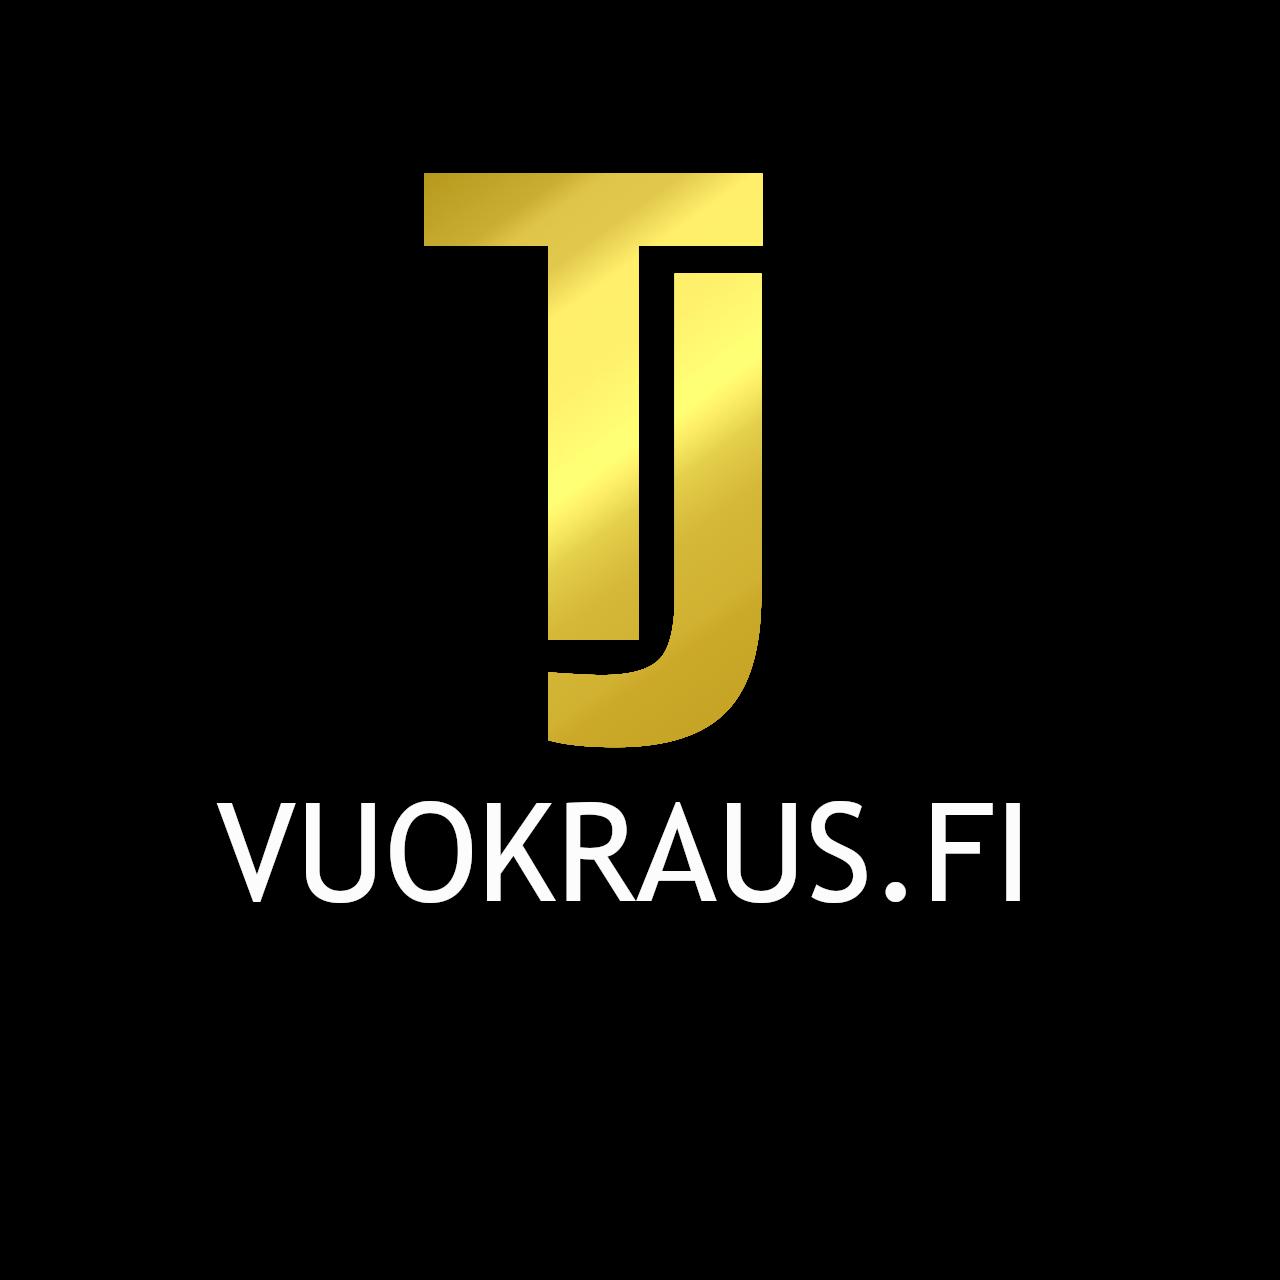 tjvuokraus logo